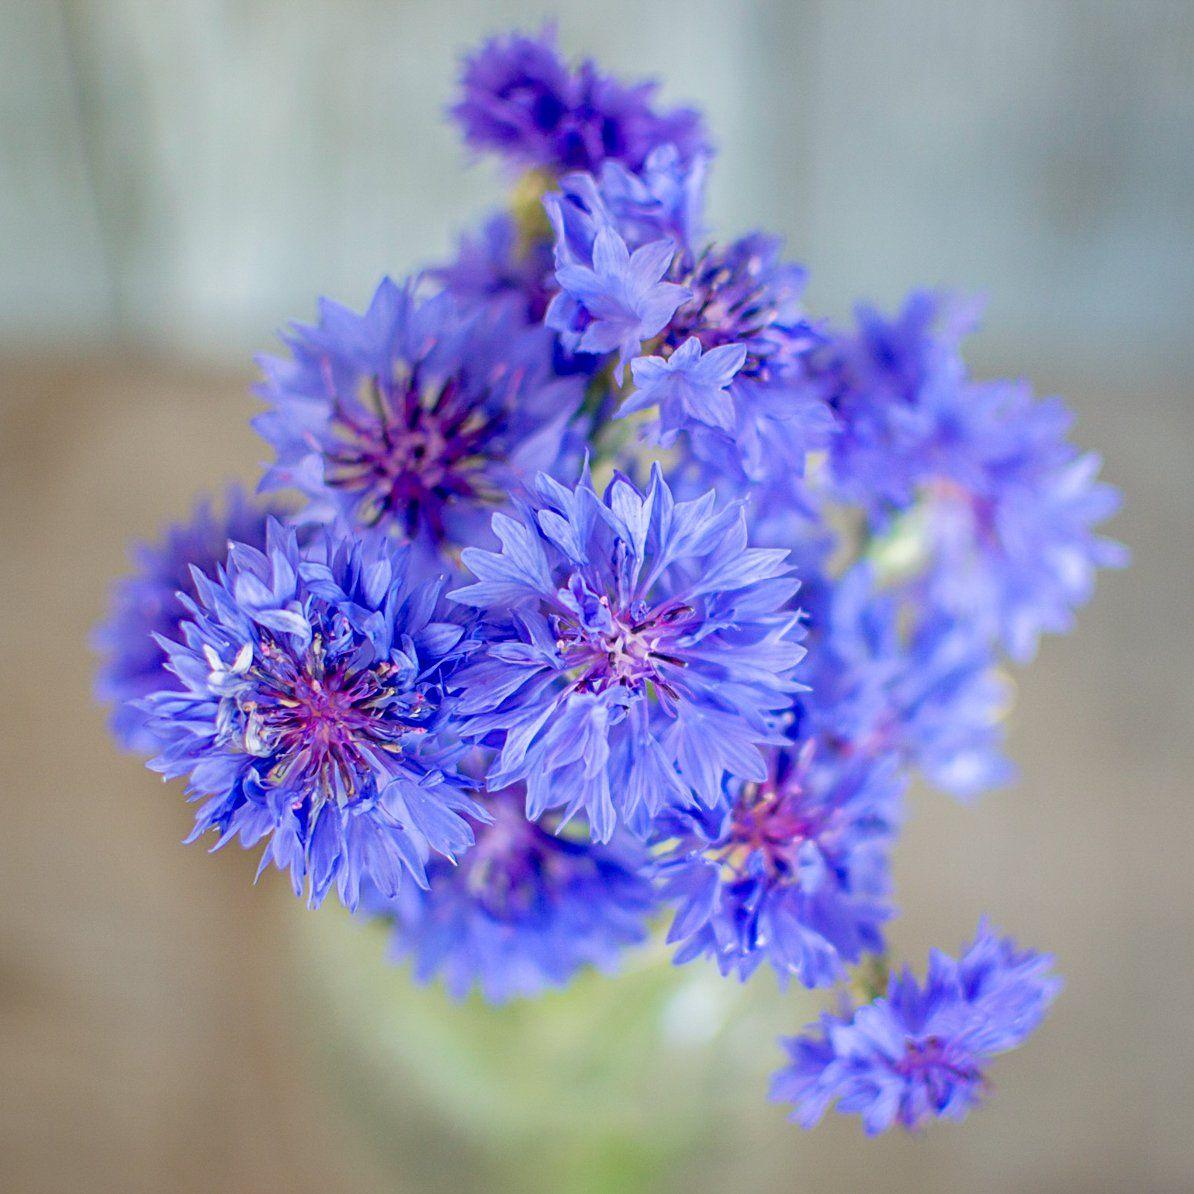 Florist blue boy centaurea dried flowers seed starting